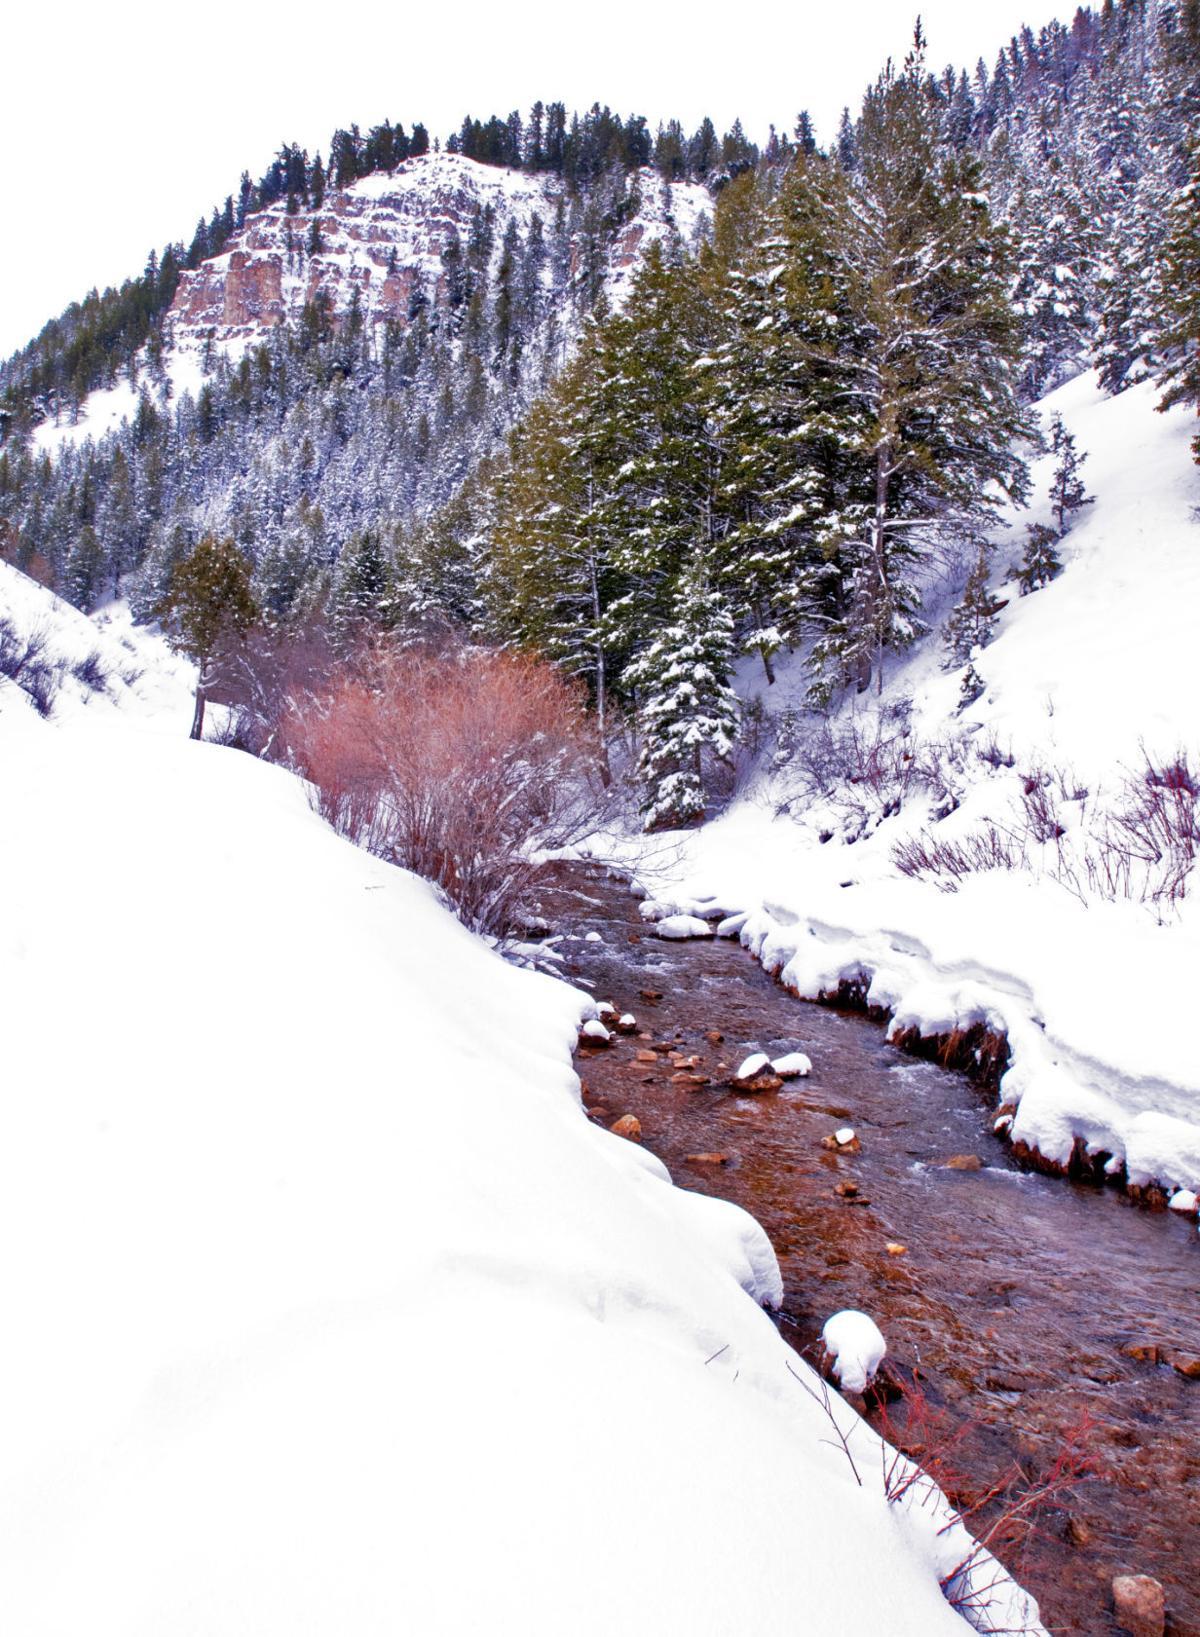 Temple Fork - Spawn Creek